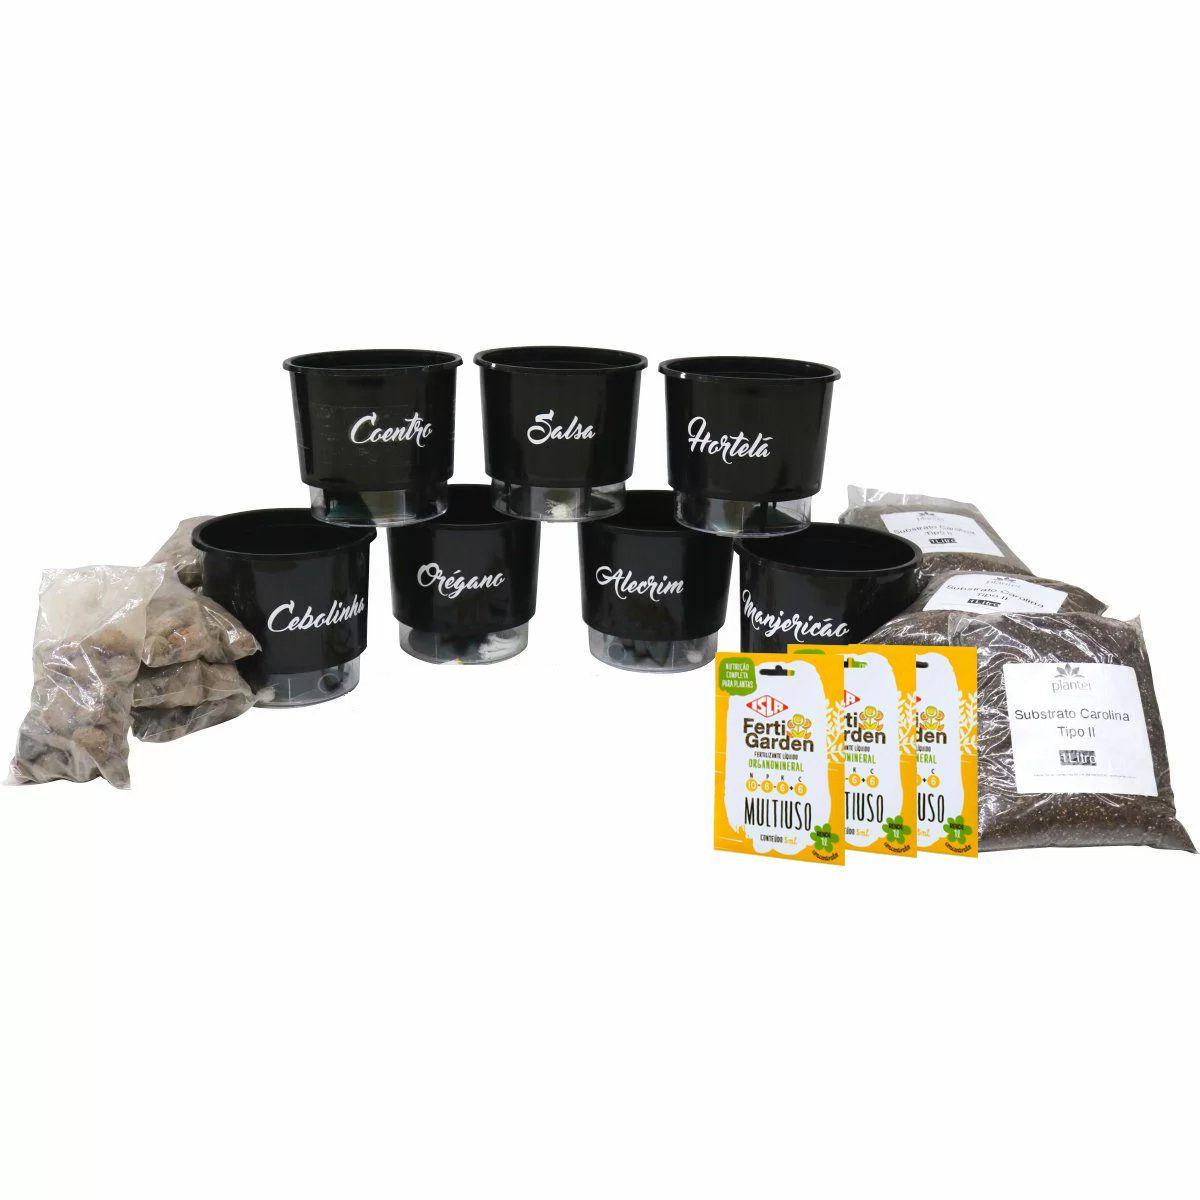 Kit 7 Vasos Autoirrigáveis Raiz N03 Gourmet + Substratos + Argila Expandida + Brinde